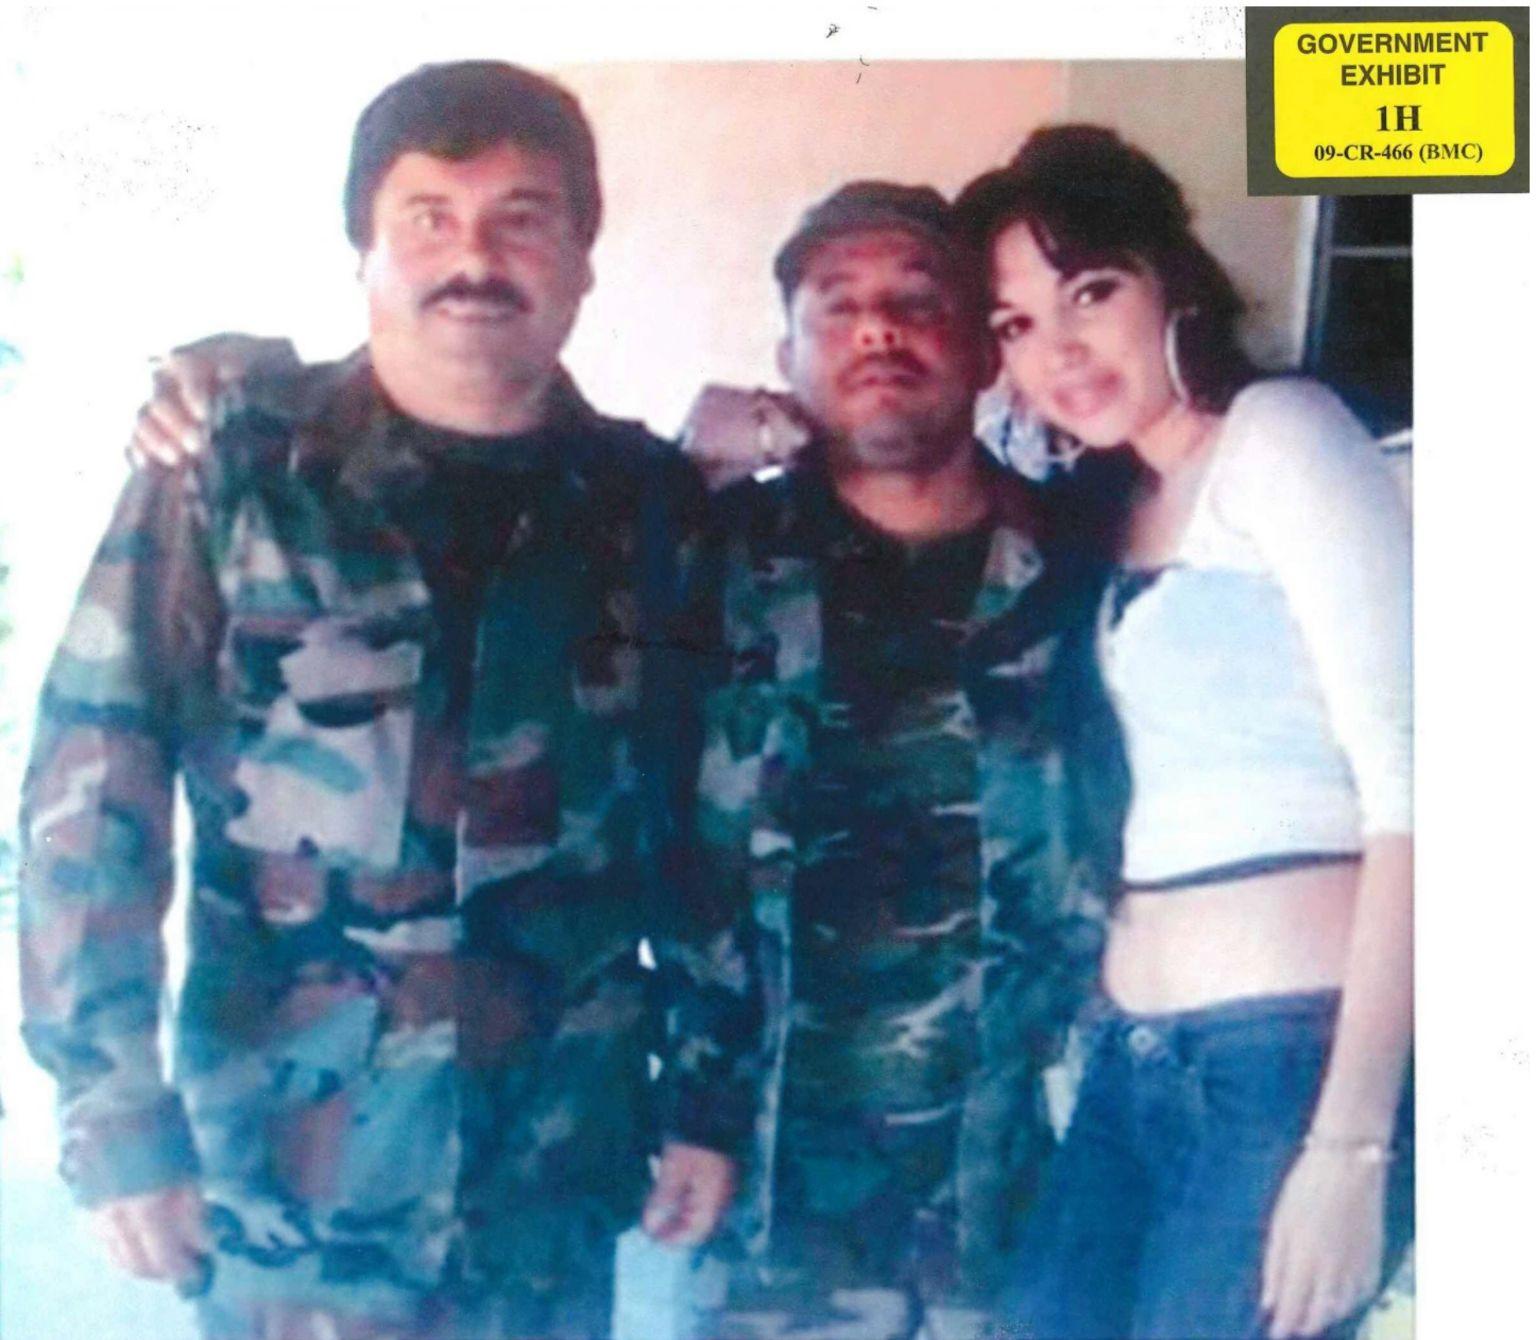 El Chapo with his former personal assistant. Alex Cifuentes Villa, and Villa's girlfriend